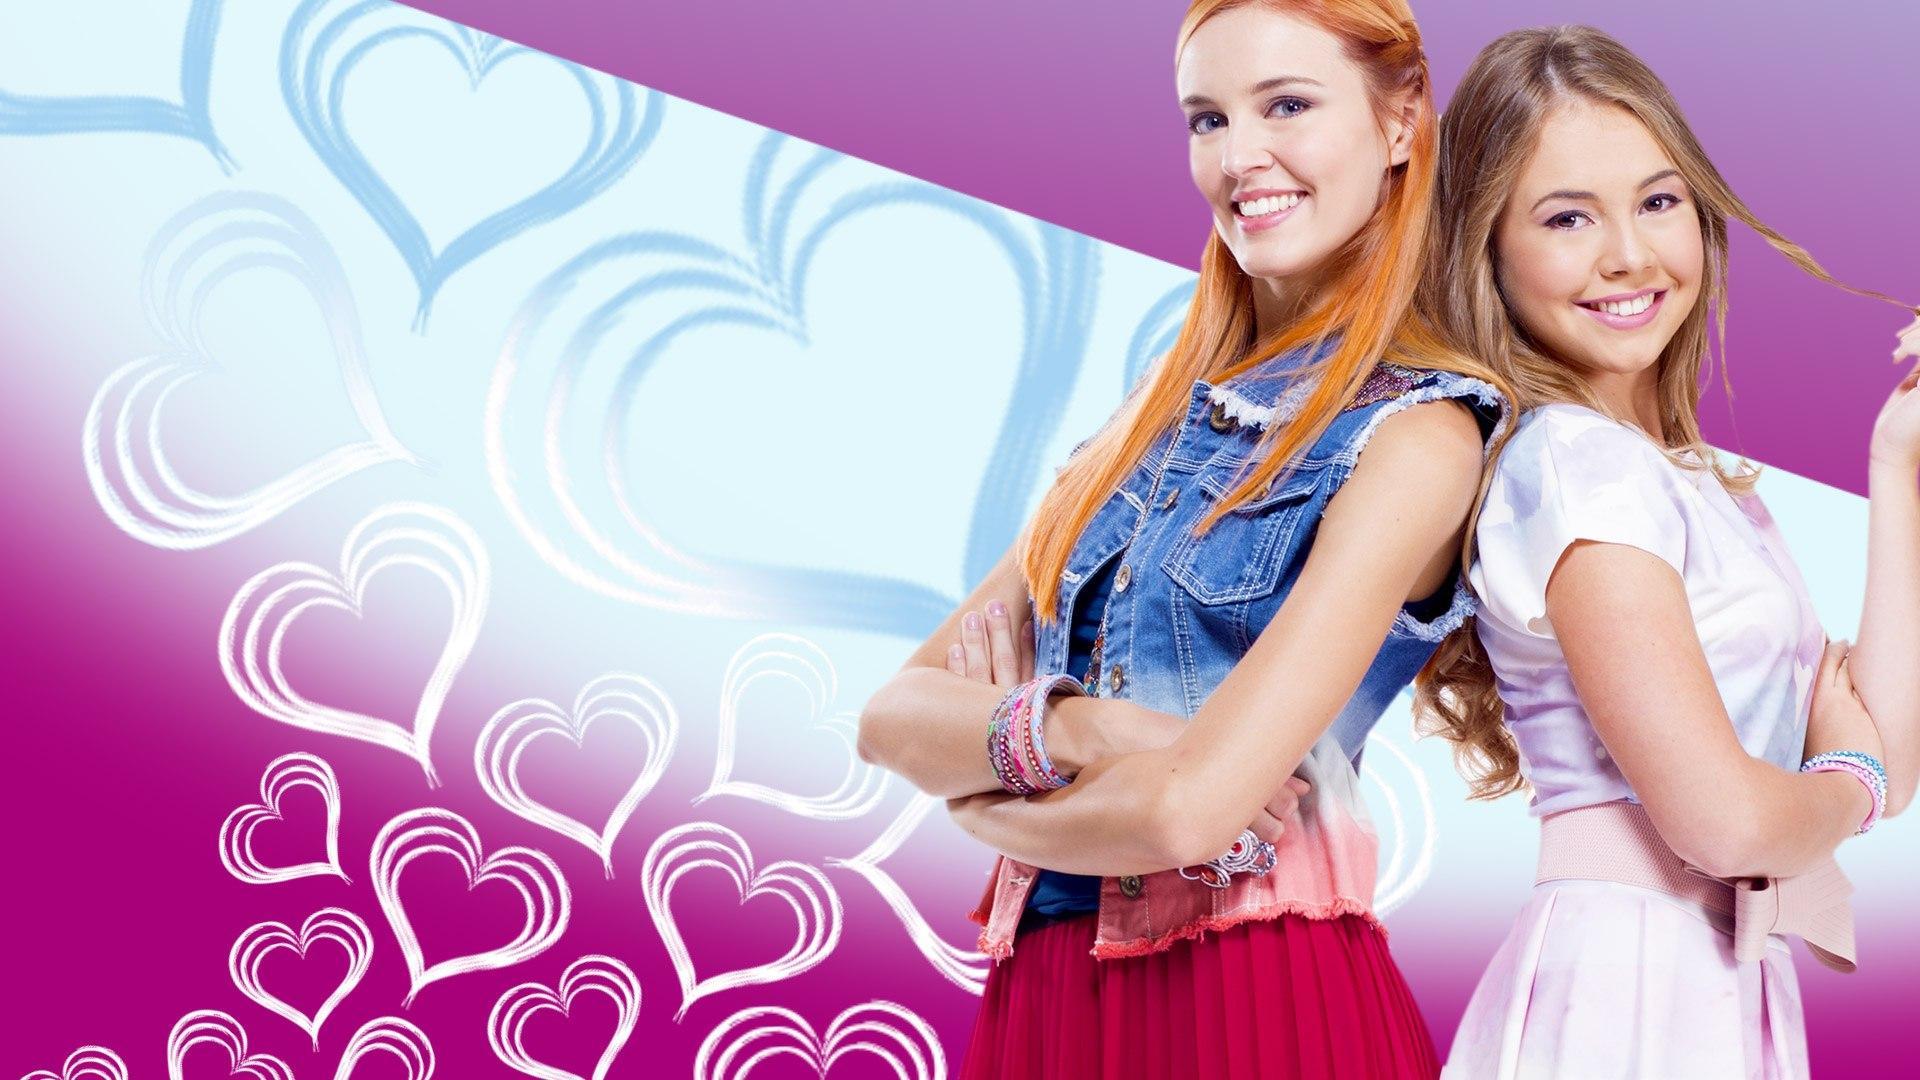 DeAKids Maggie & Bianca Fashion Friends